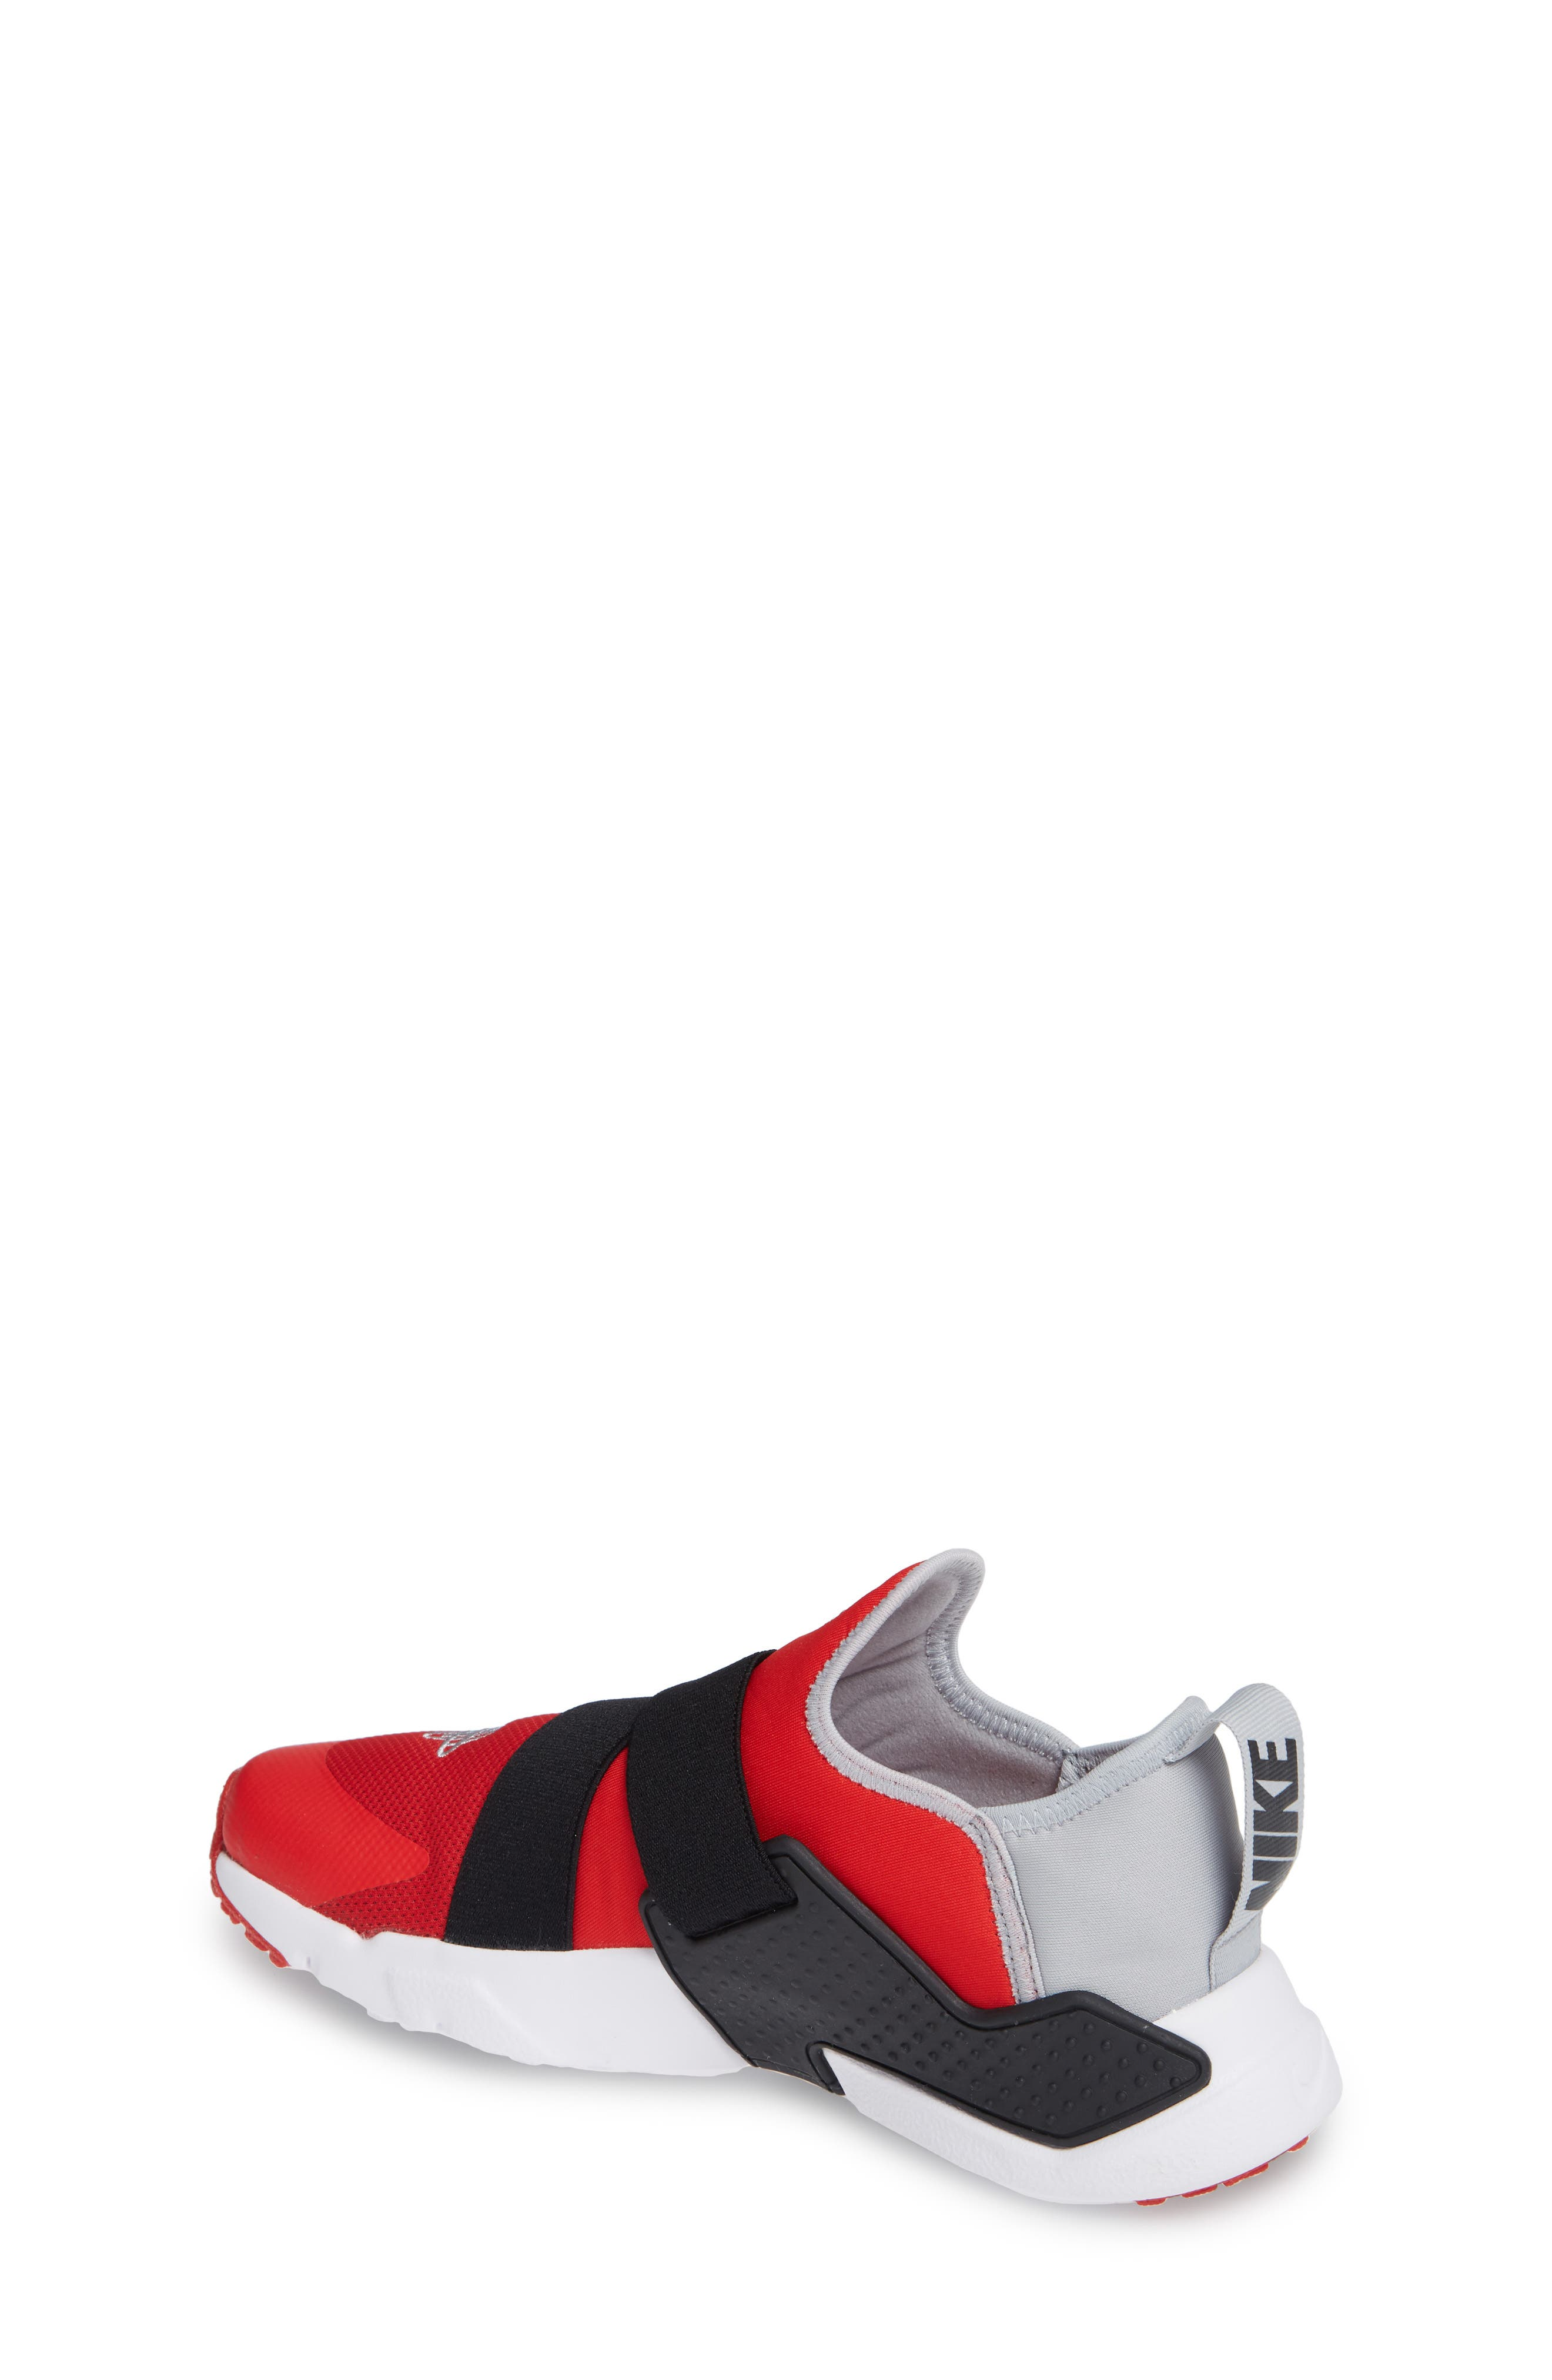 Huarache Extreme Sneaker,                             Alternate thumbnail 2, color,                             RED/ GREY/ BLACK/ WHITE